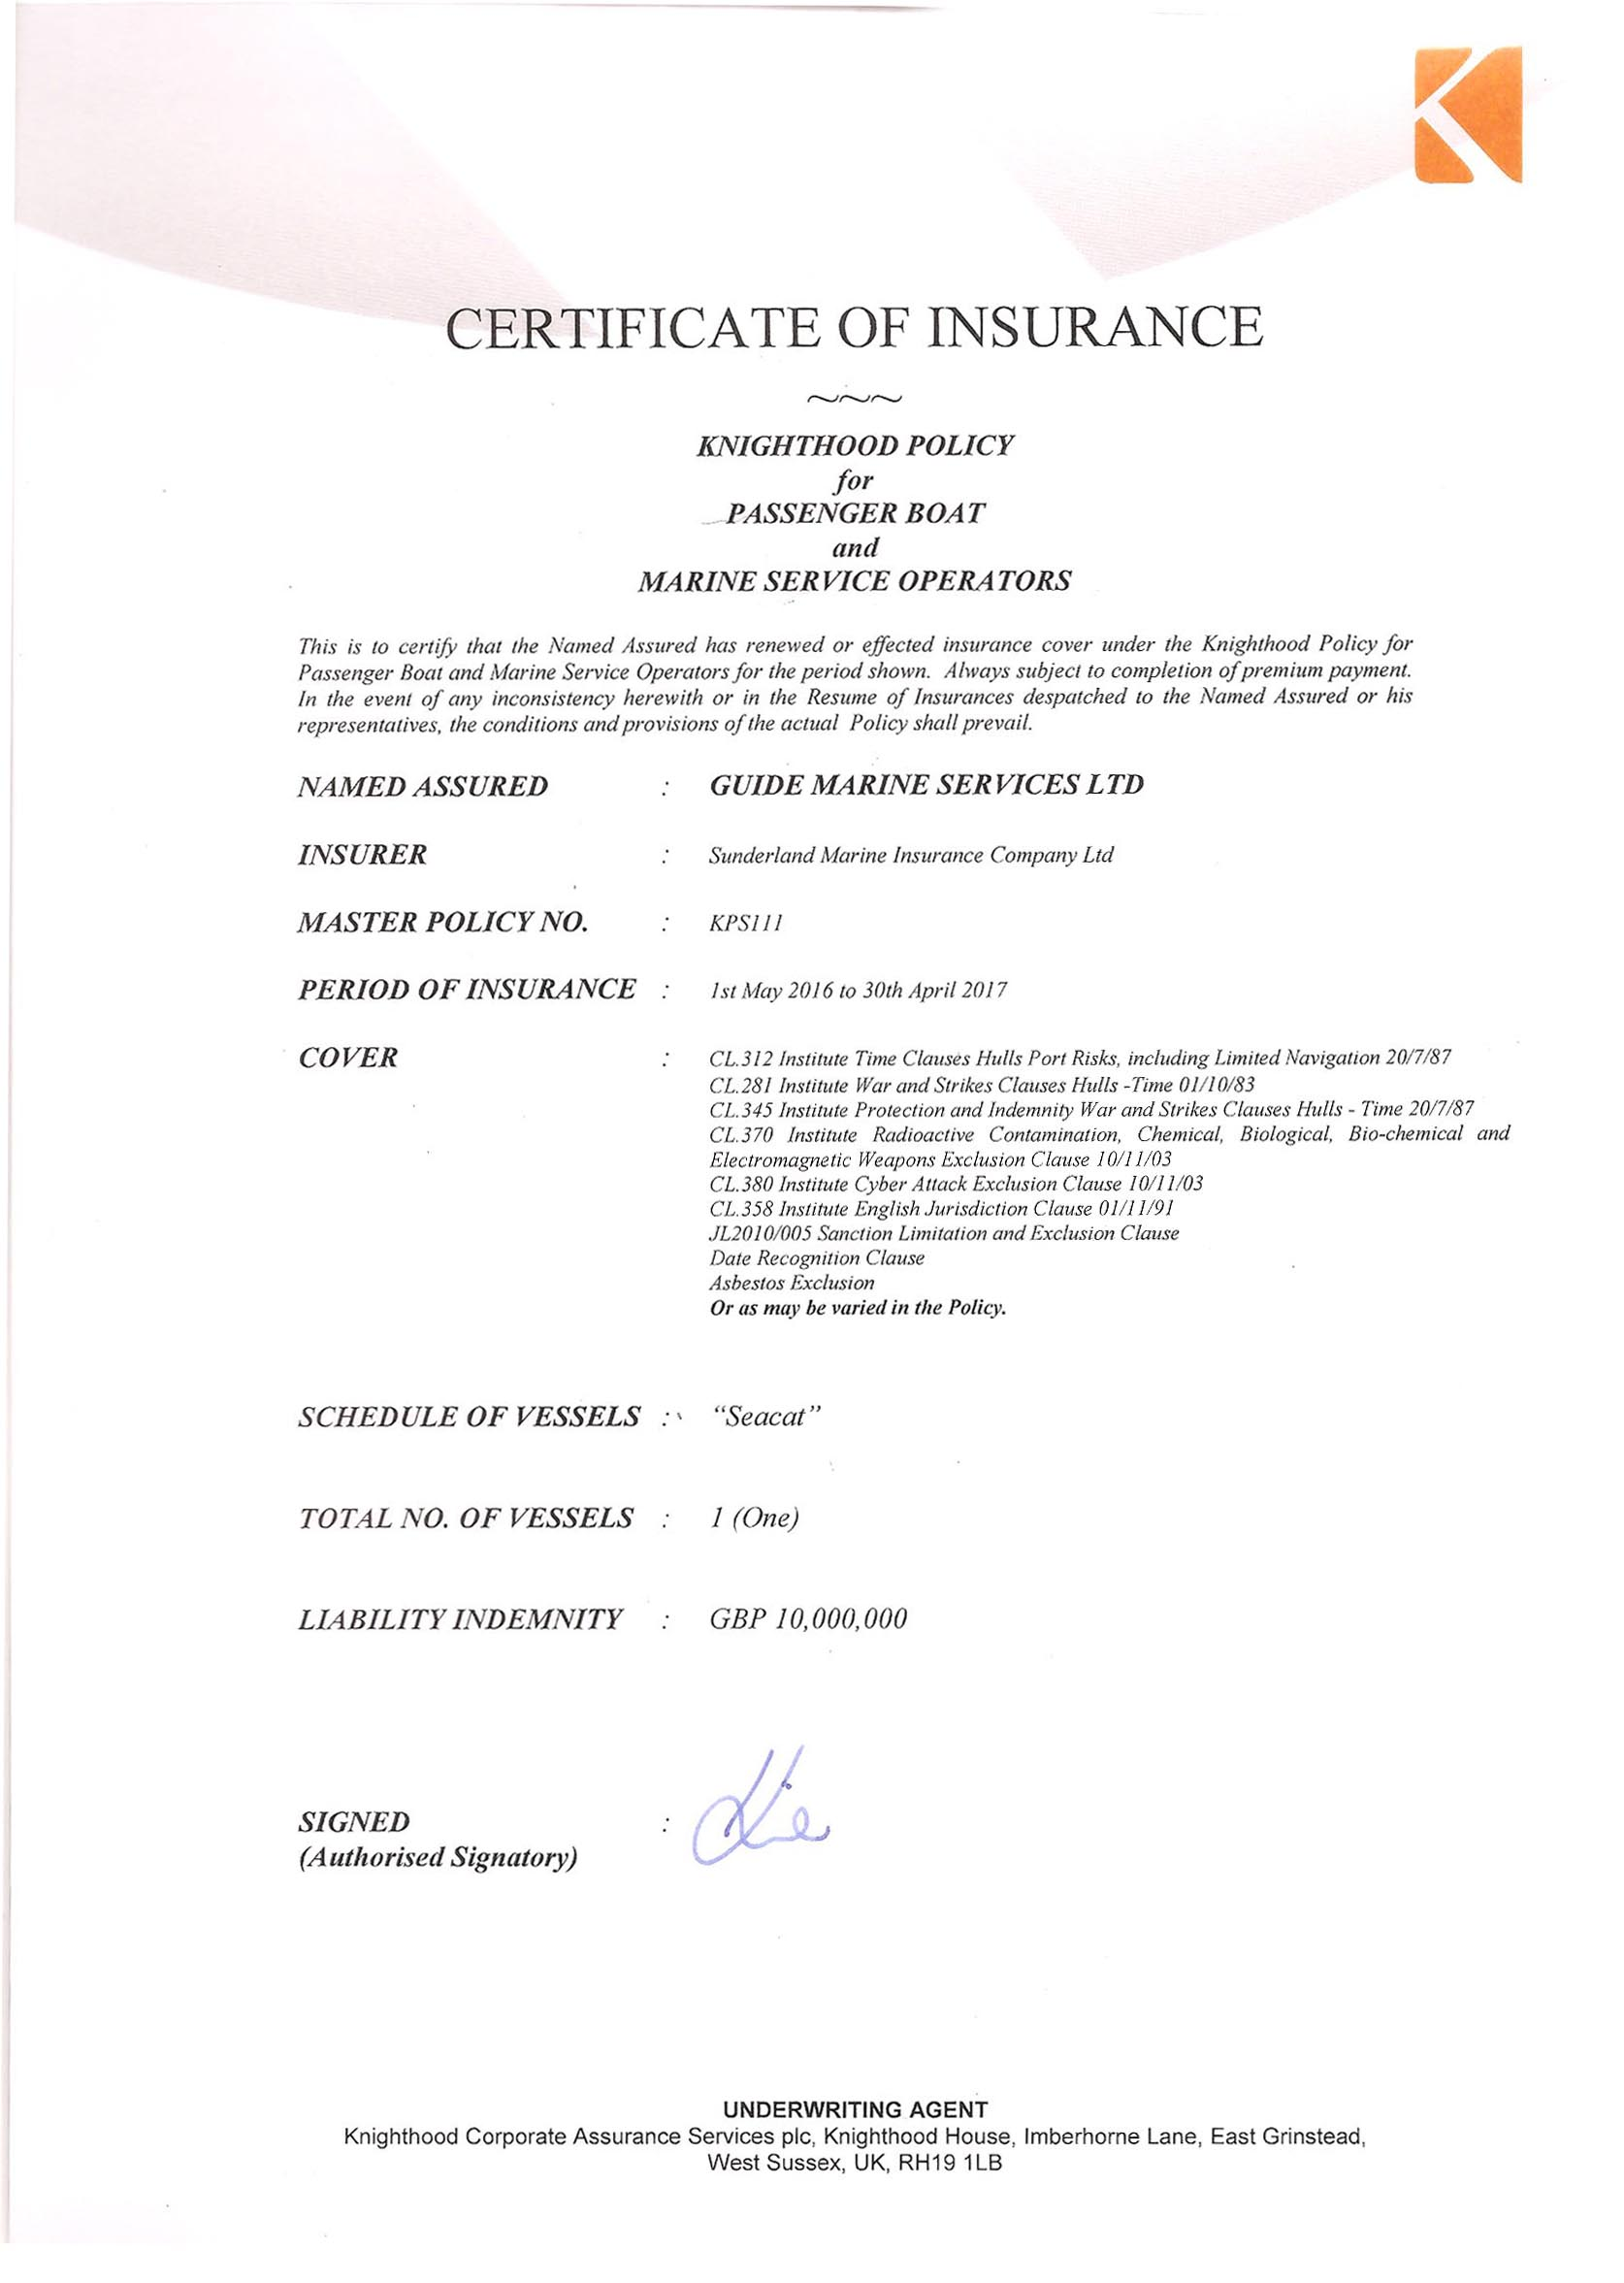 Seacat Insurance Certificate